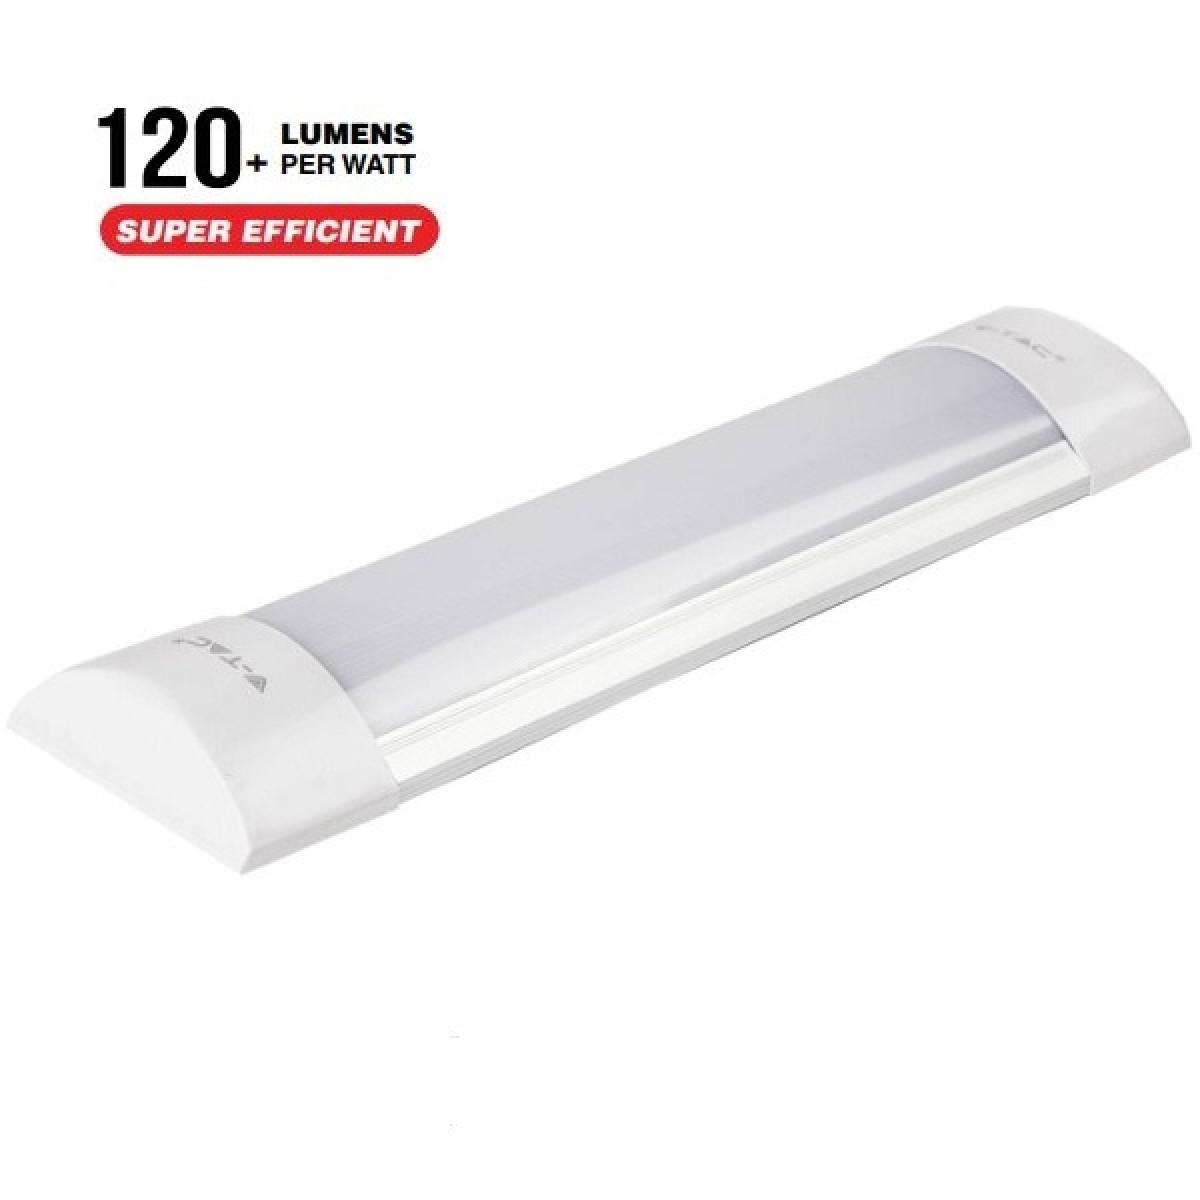 PLAFONIERA LED TUBO LED SMD PRISMATICO PRISMATICO PLAFONIERA 10W LAMPAD